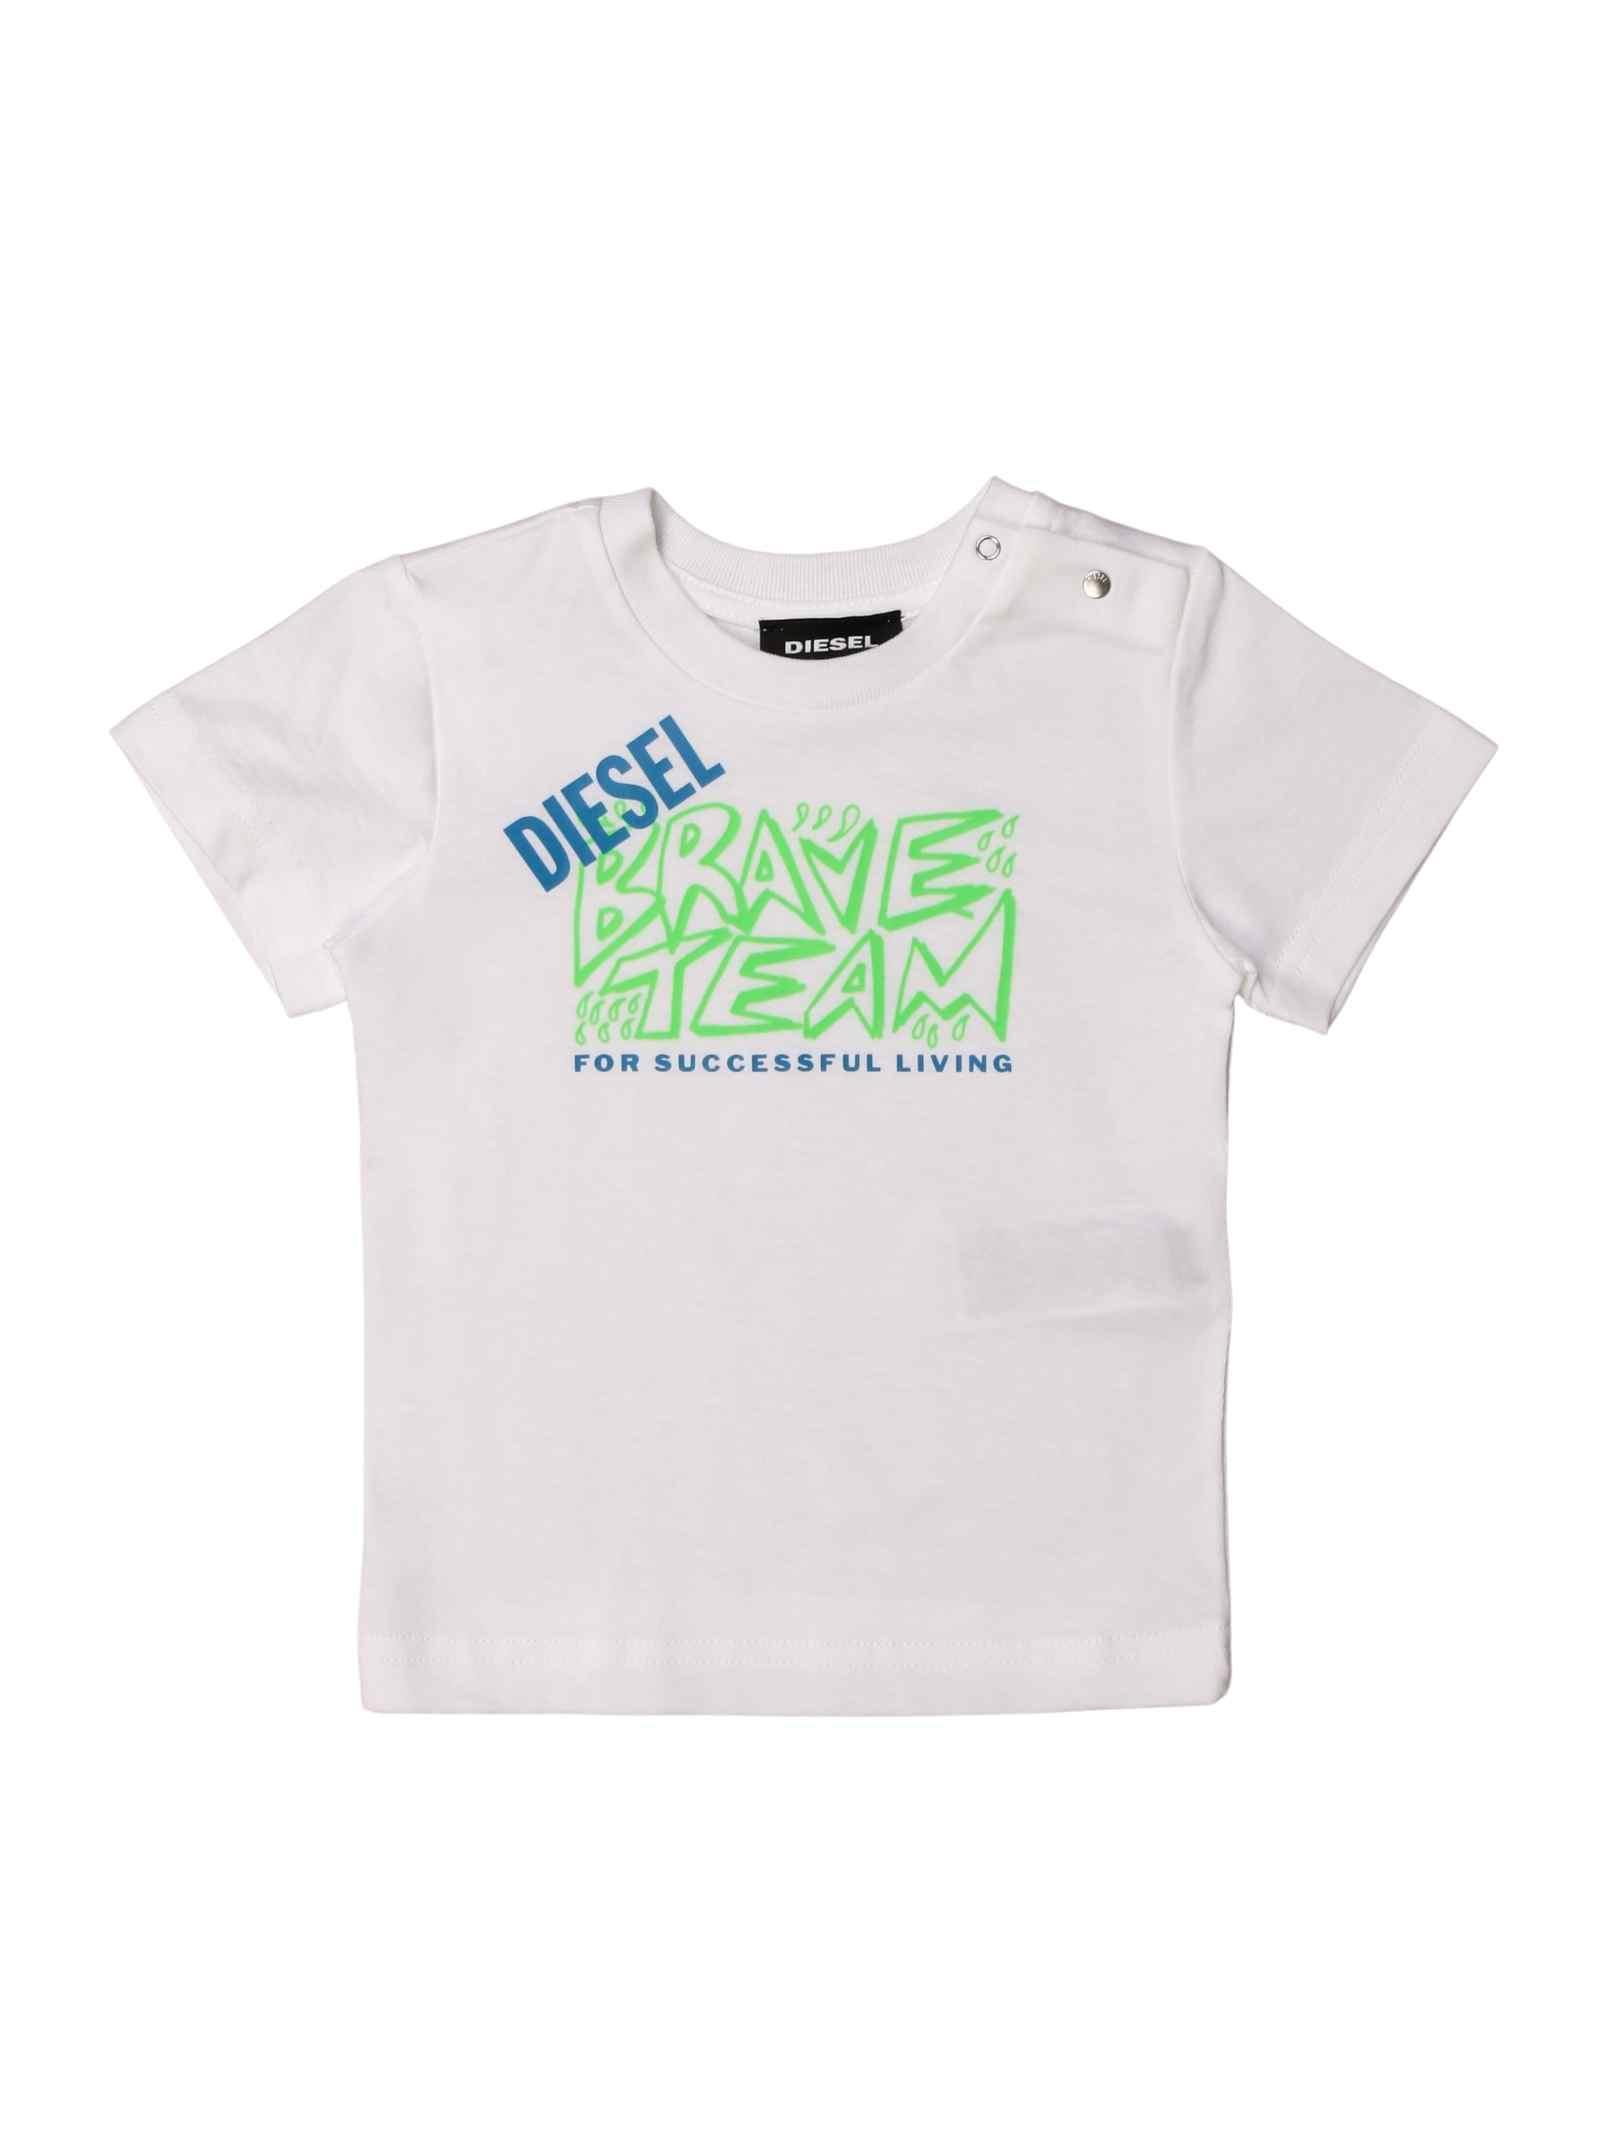 DIESEL | T-shirt | K00038 00YI9K100